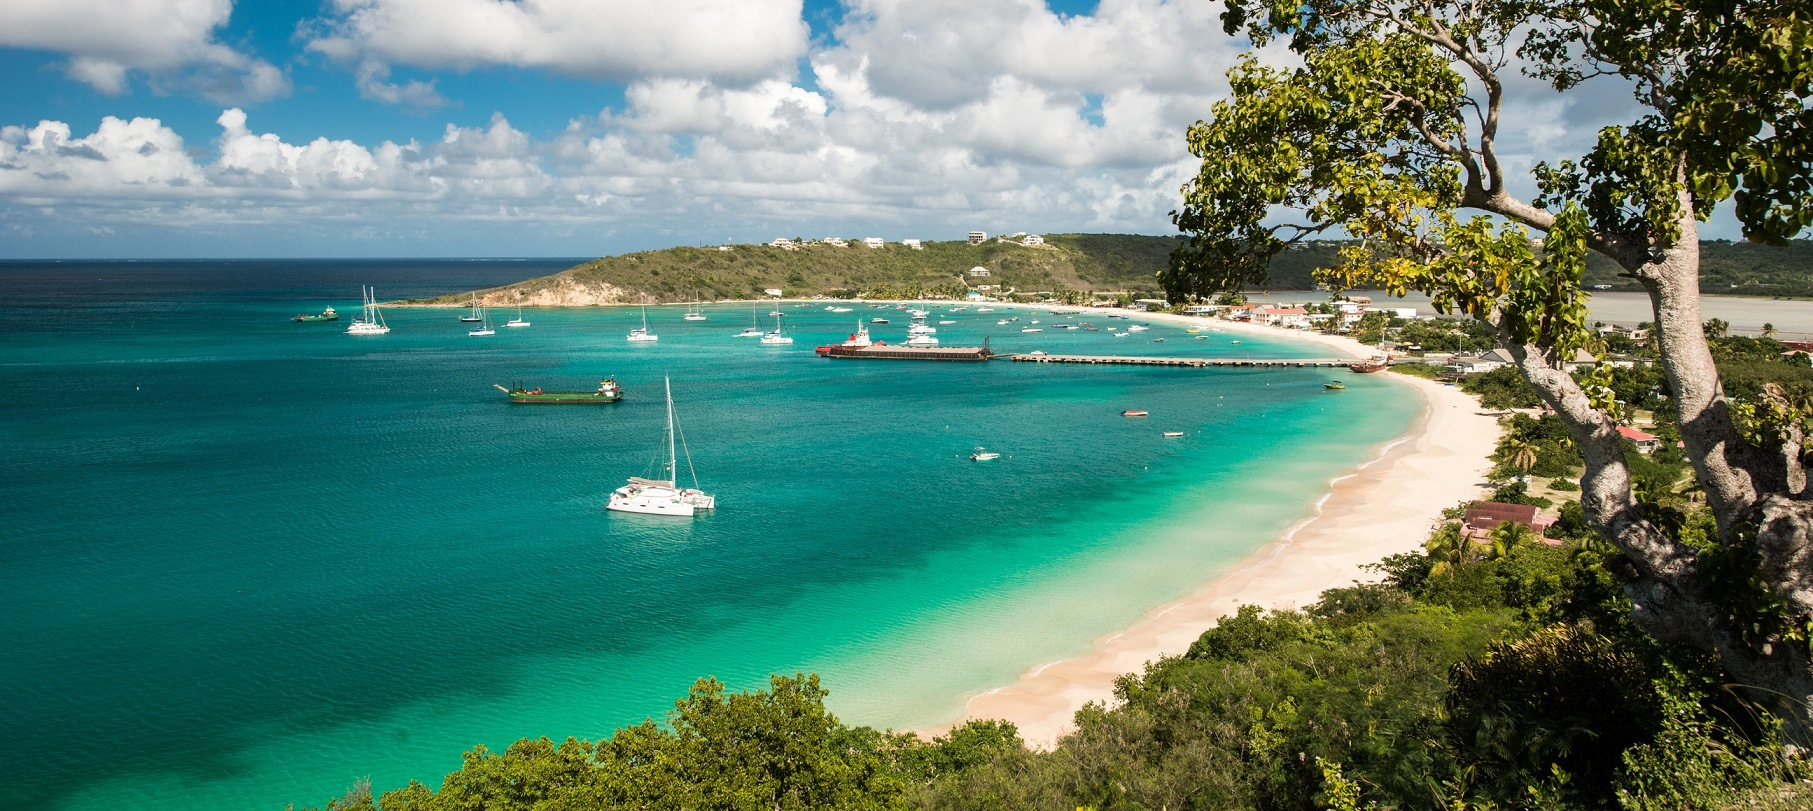 Anguilla island in the Caribbean